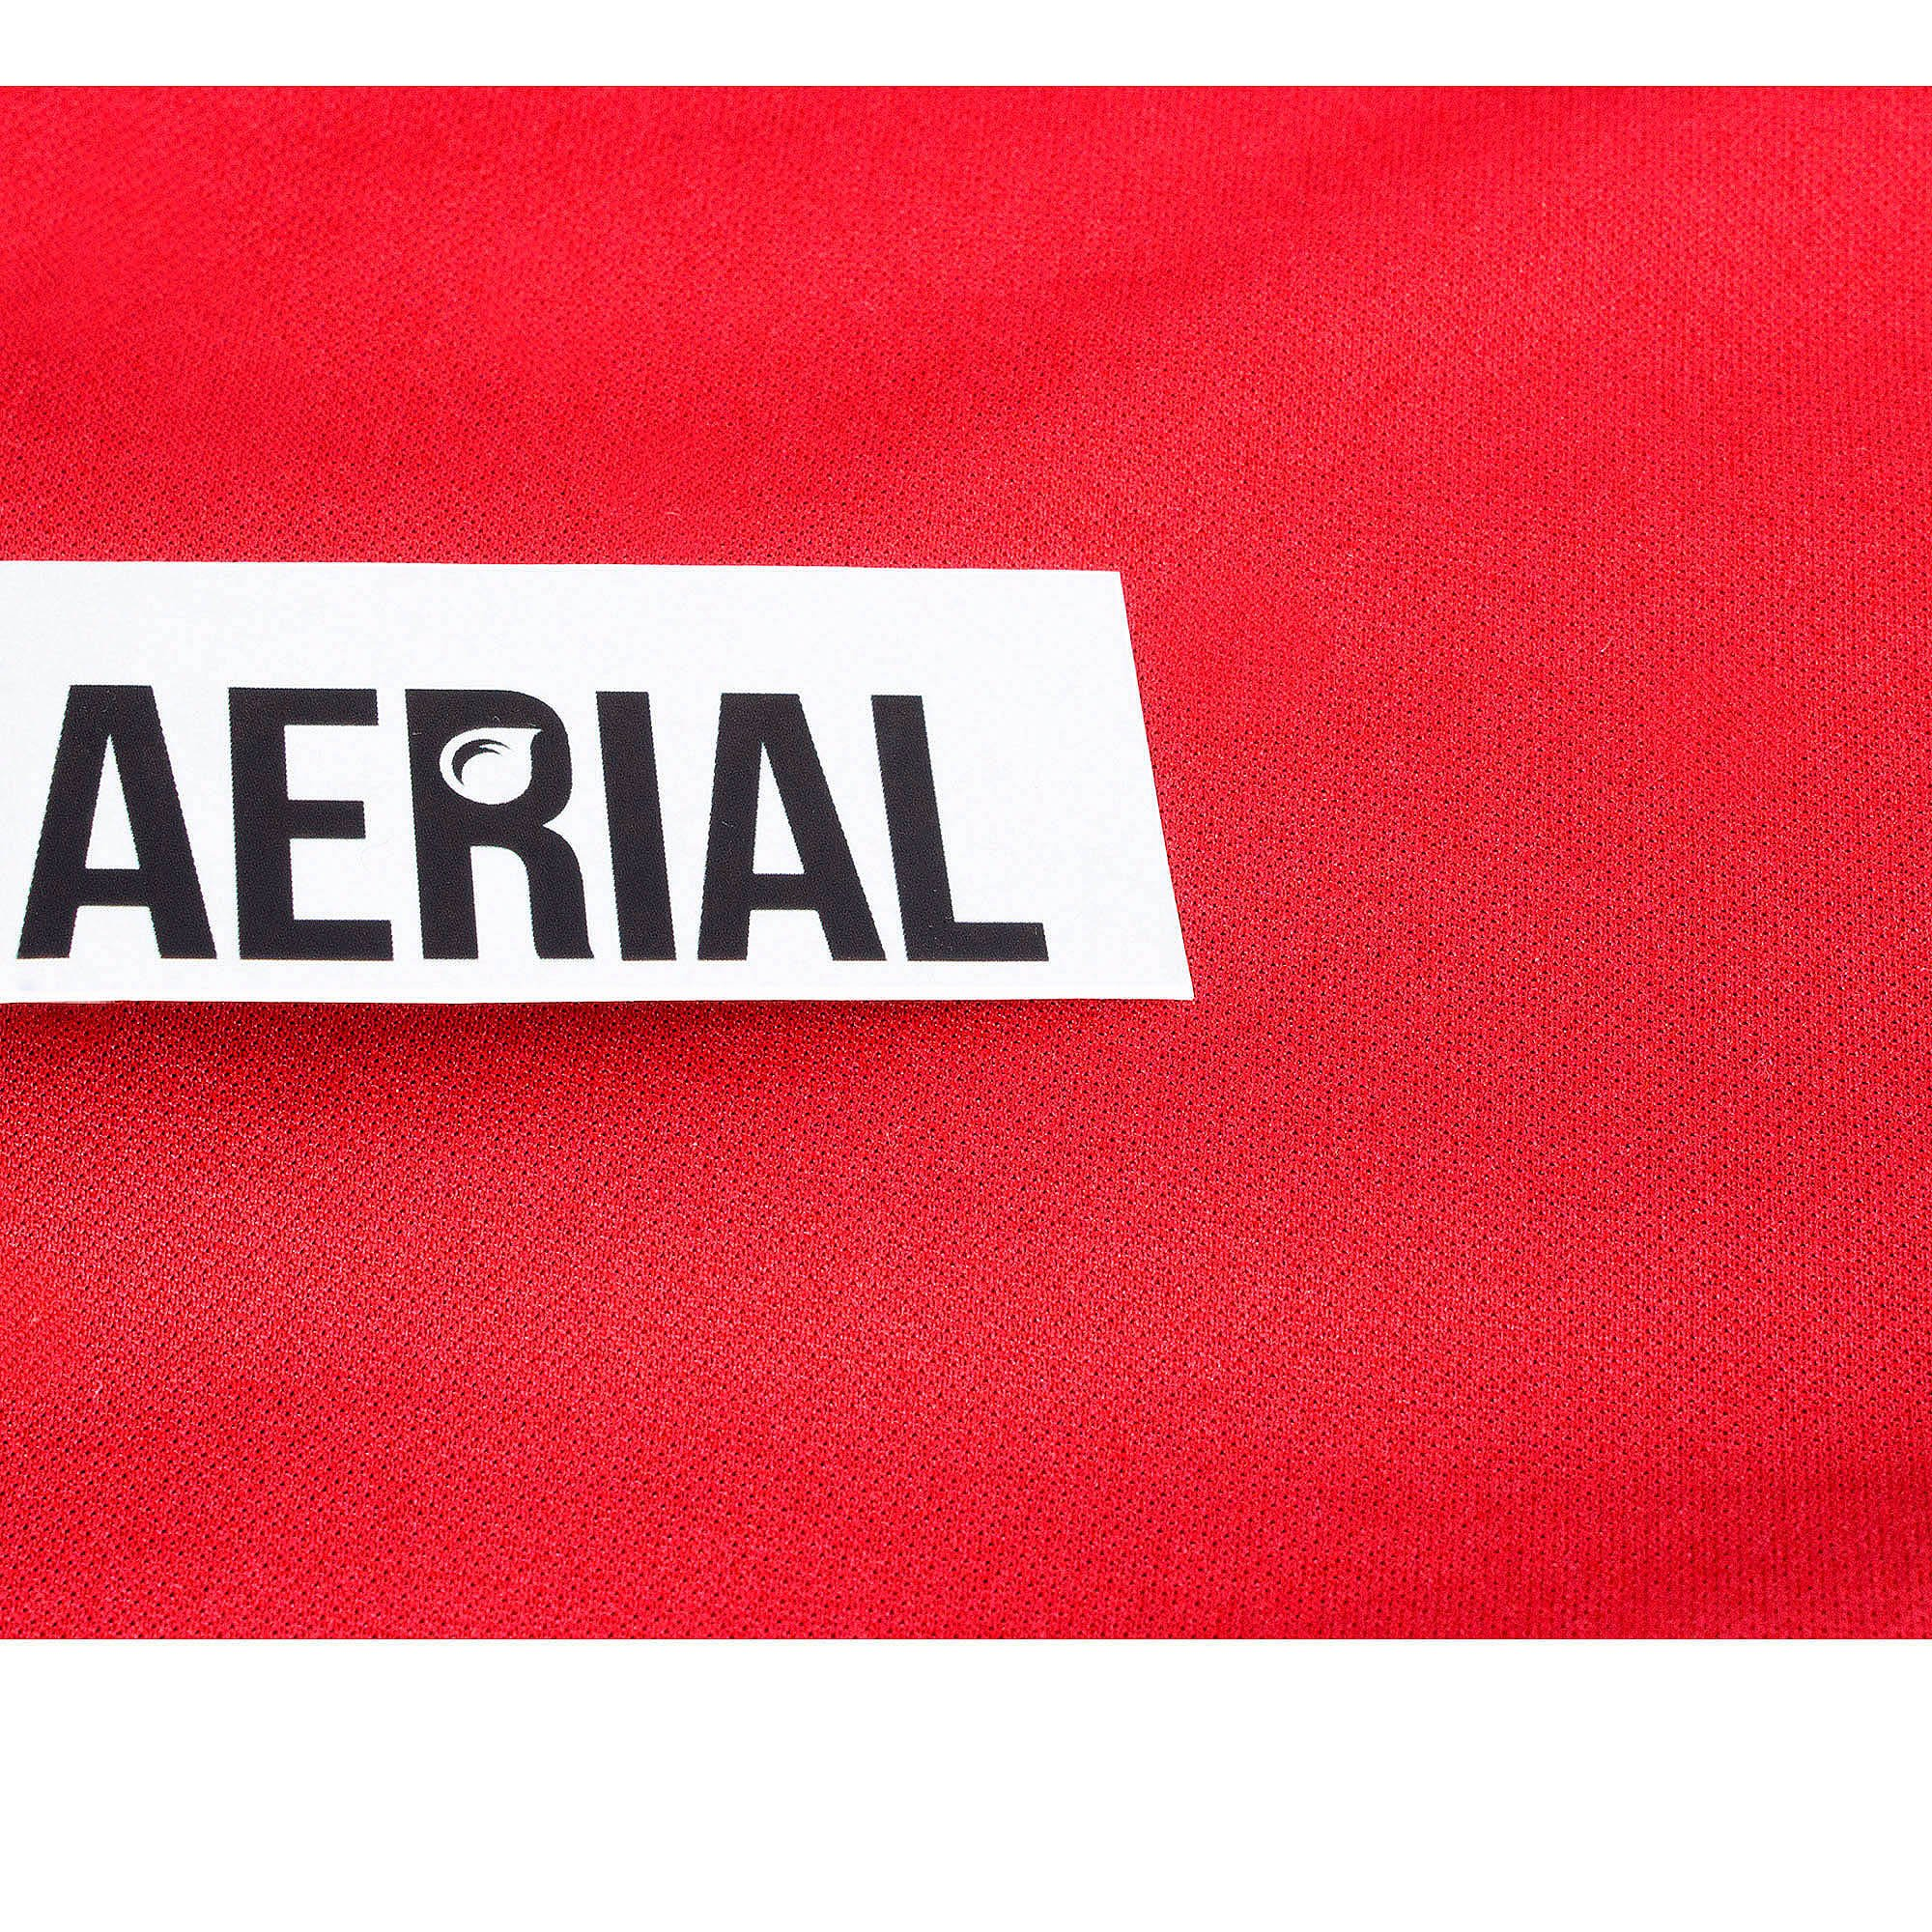 Firetoys Professional Aerial Silks Fabric/Tissues, Medium Stretch Silk WLL 128kg (Red, 8 Metre) by Firetoys (Image #5)